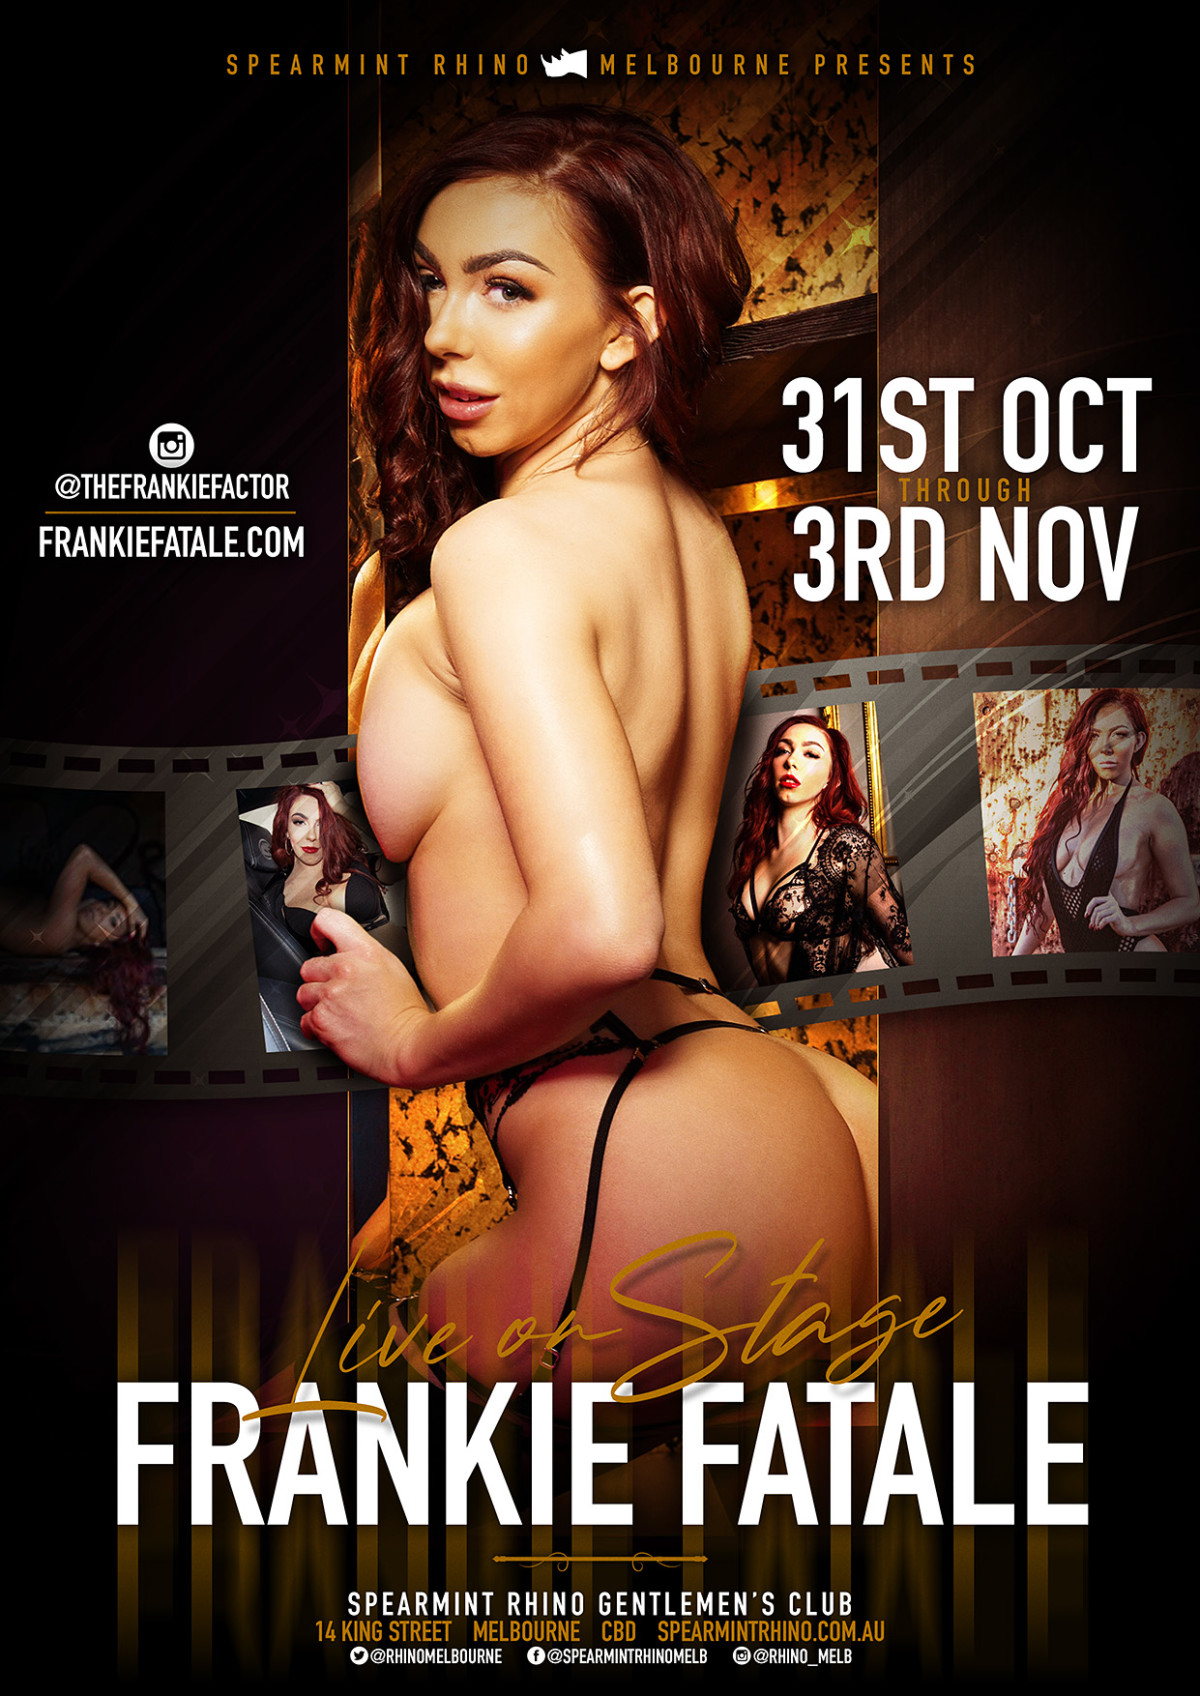 Frankie Fatale